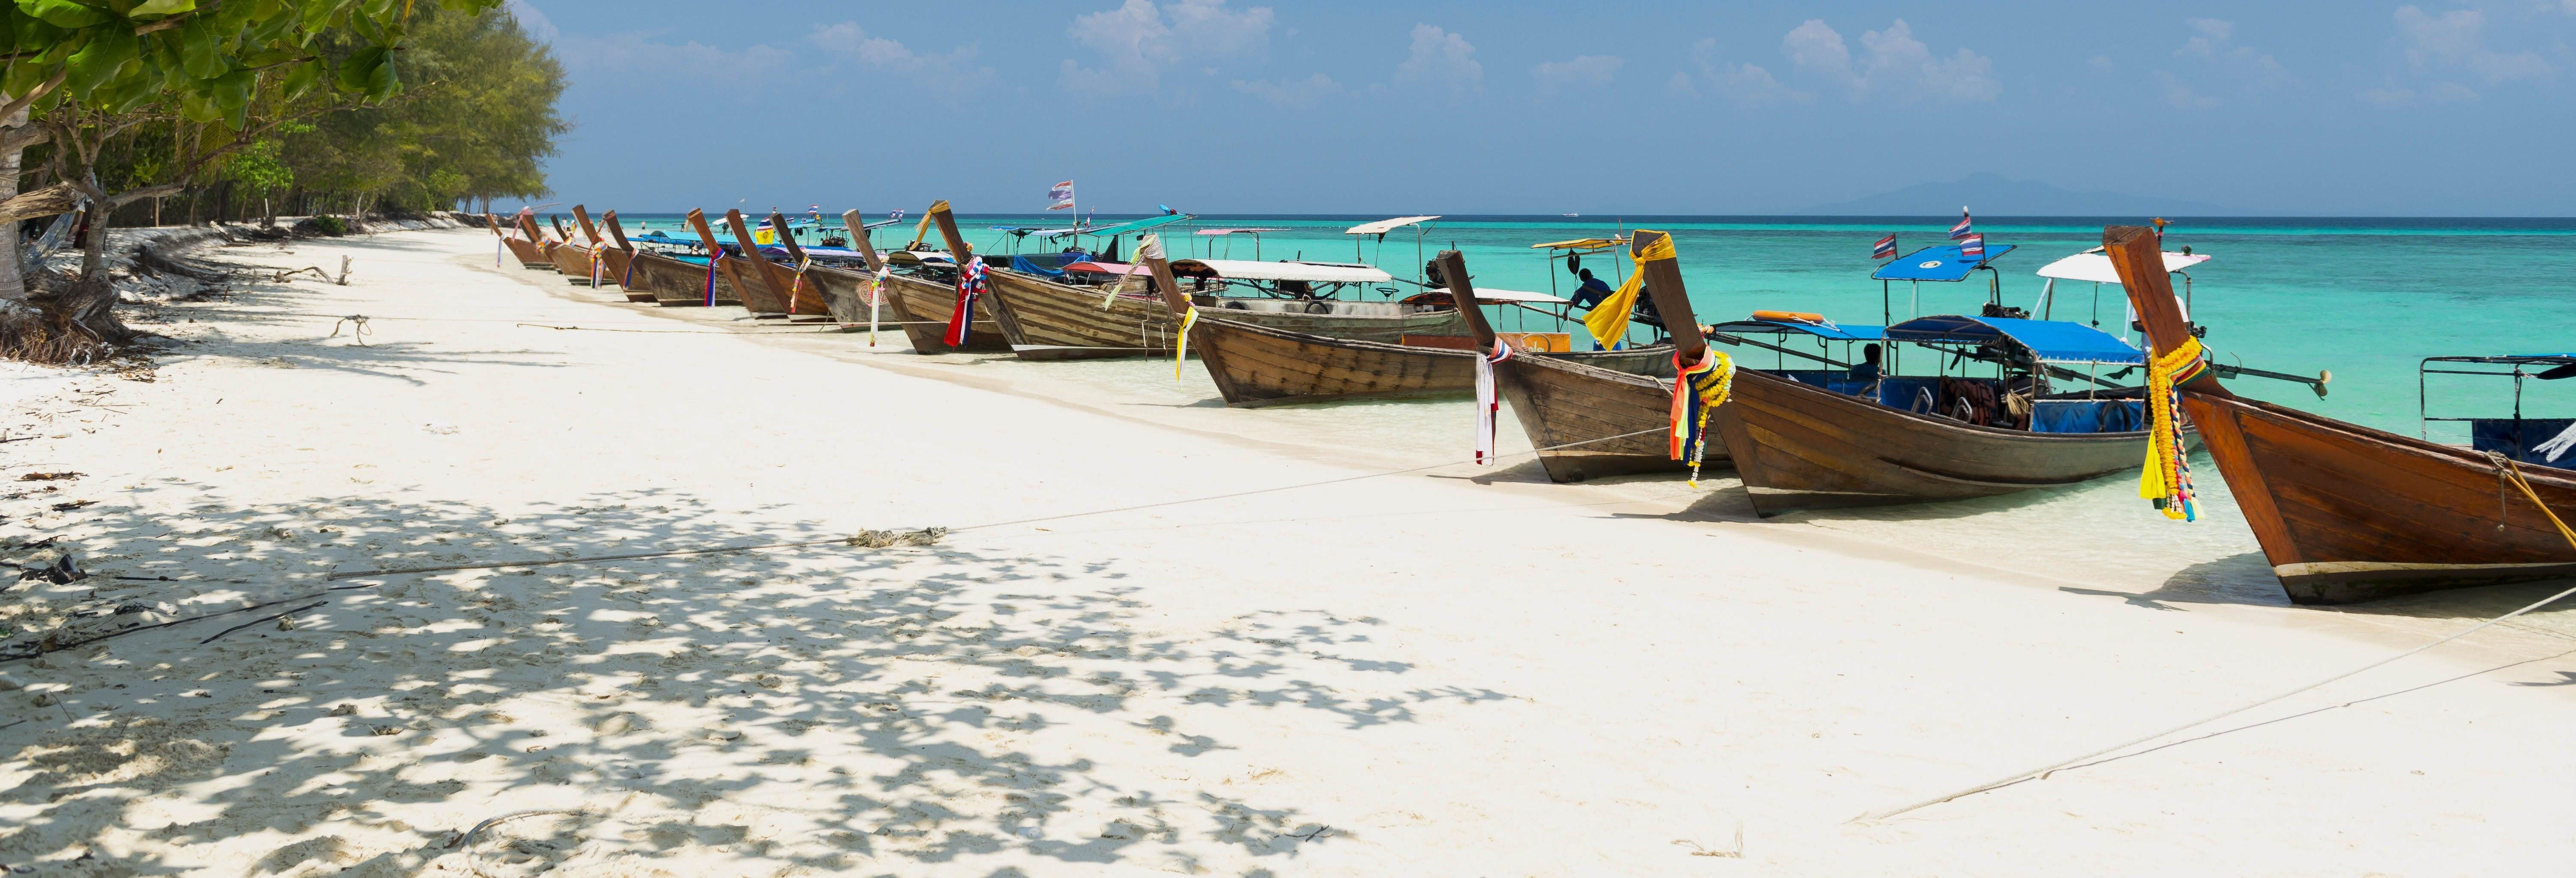 Excursão às ilhas Phi Phi de lancha